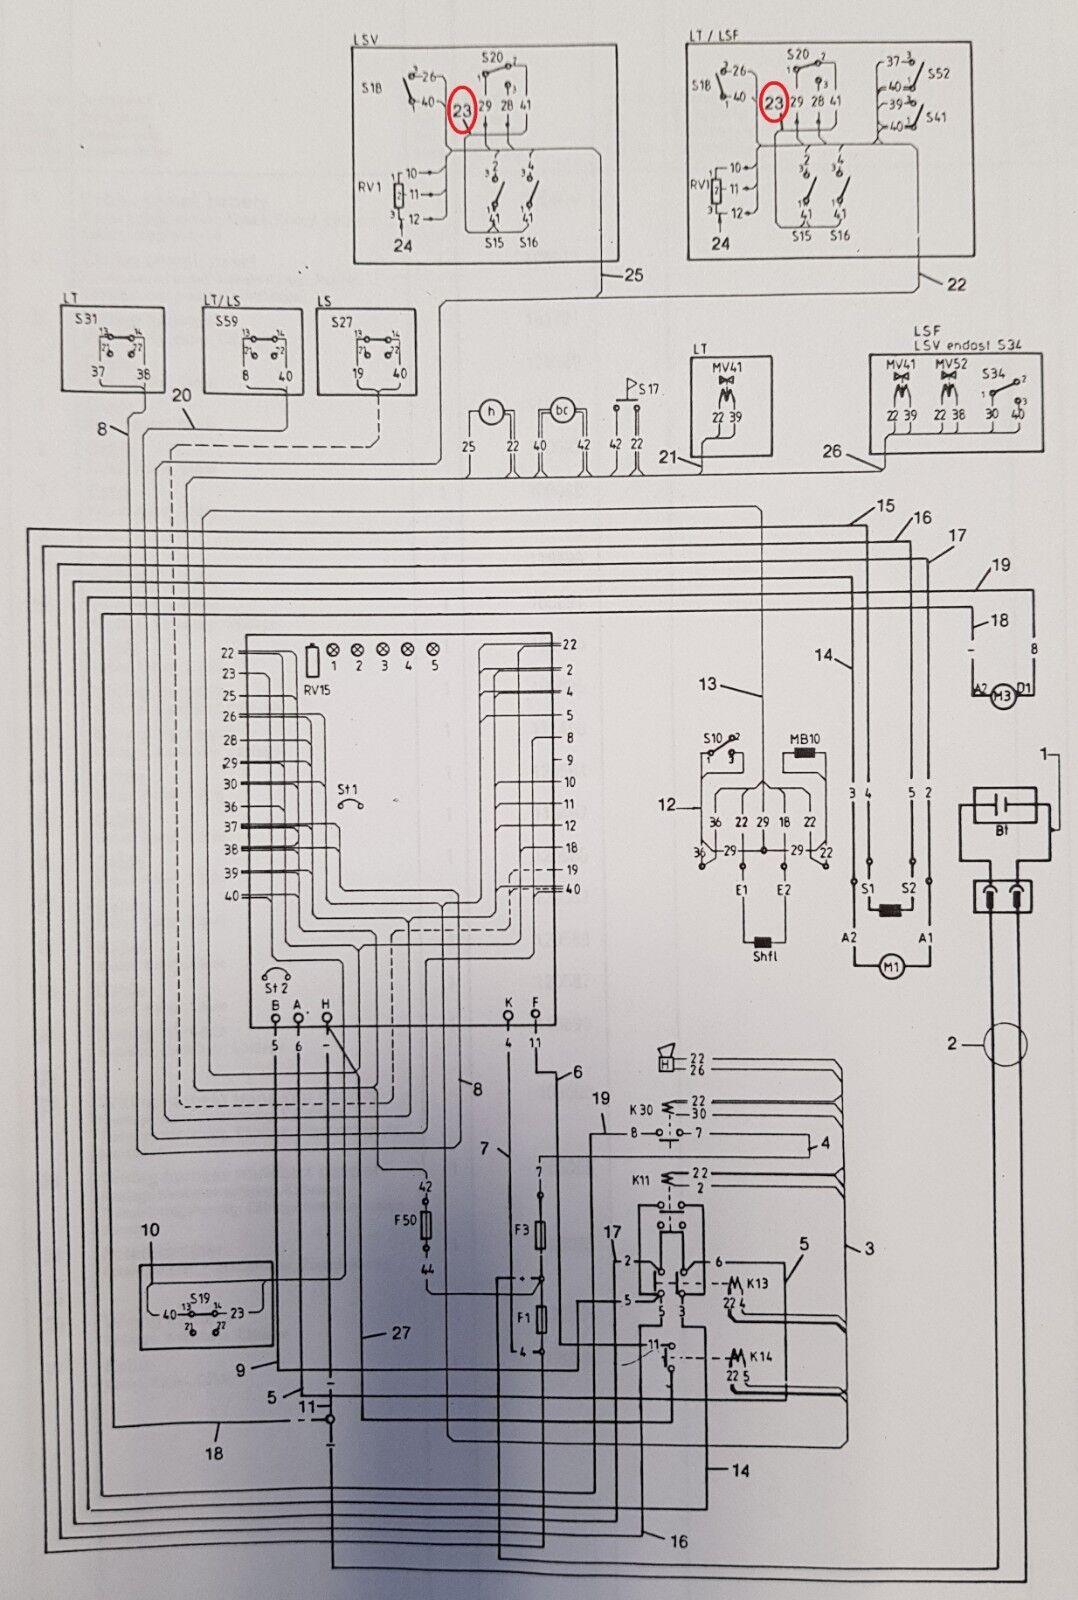 Juego de Cables Apilable BT Lt, Lsf Lsf Lsf , Lsv Tipo-E Transistorsteuerung 106065 220297